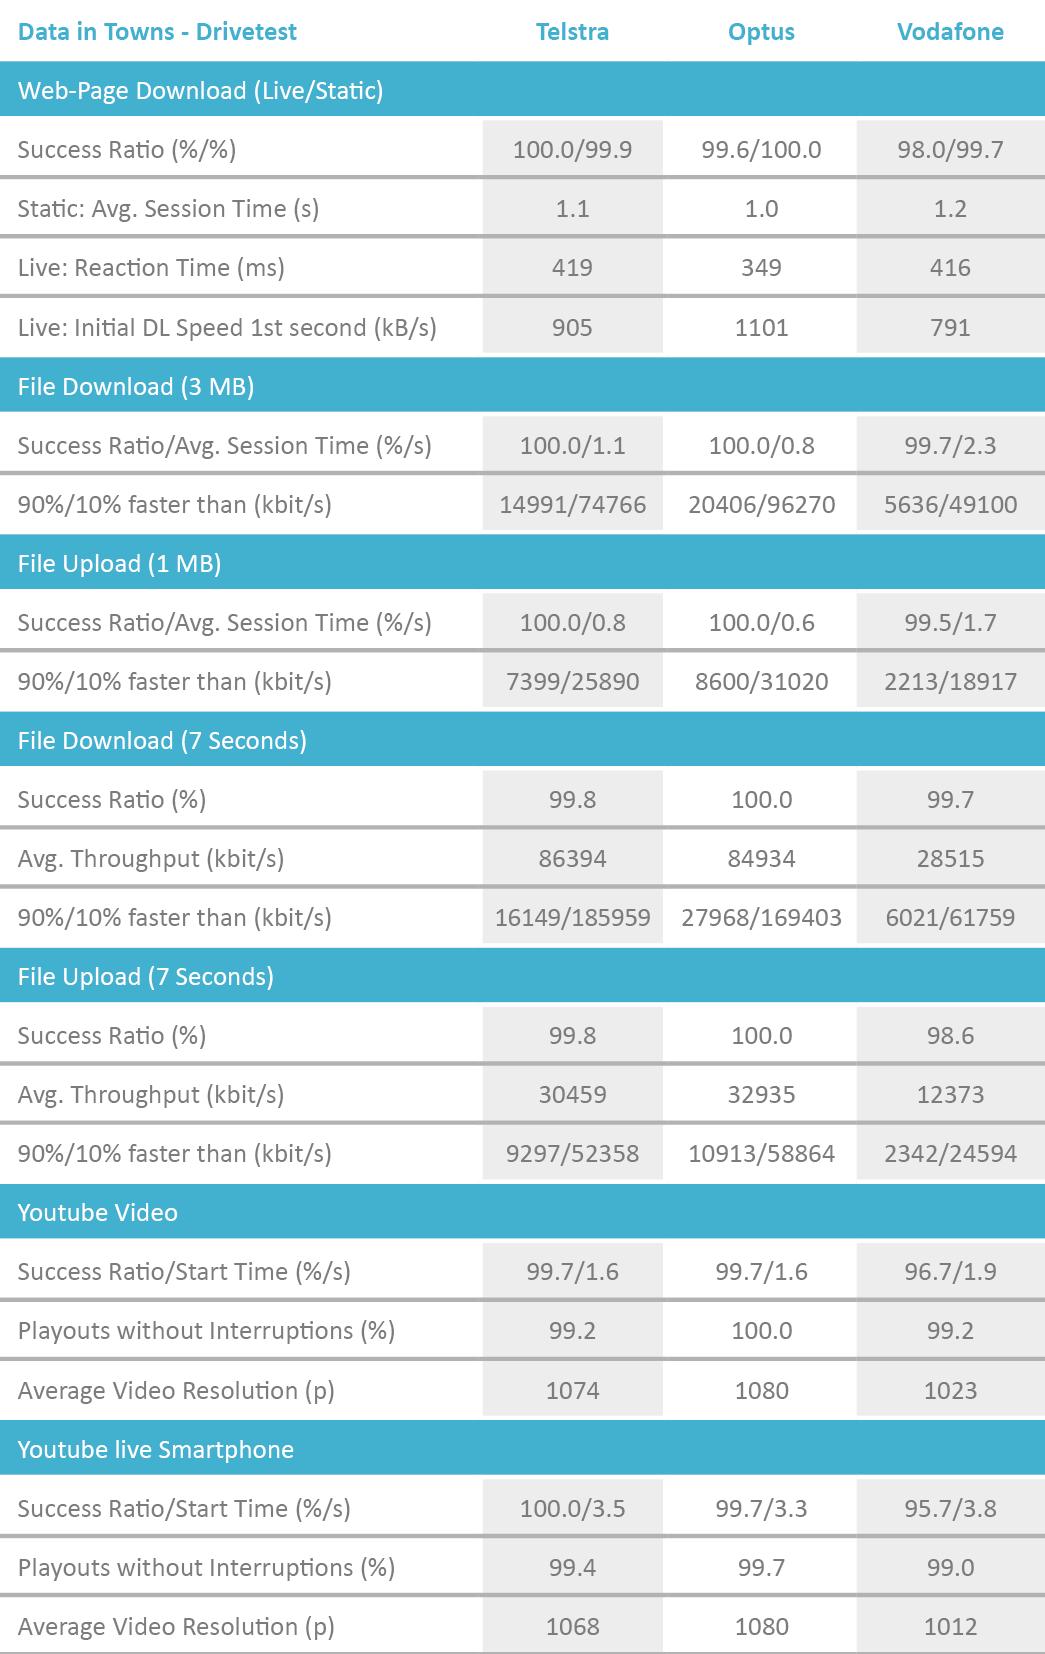 AUS_Tabelle_DataTowns_Drivetest_2018_englisch.png